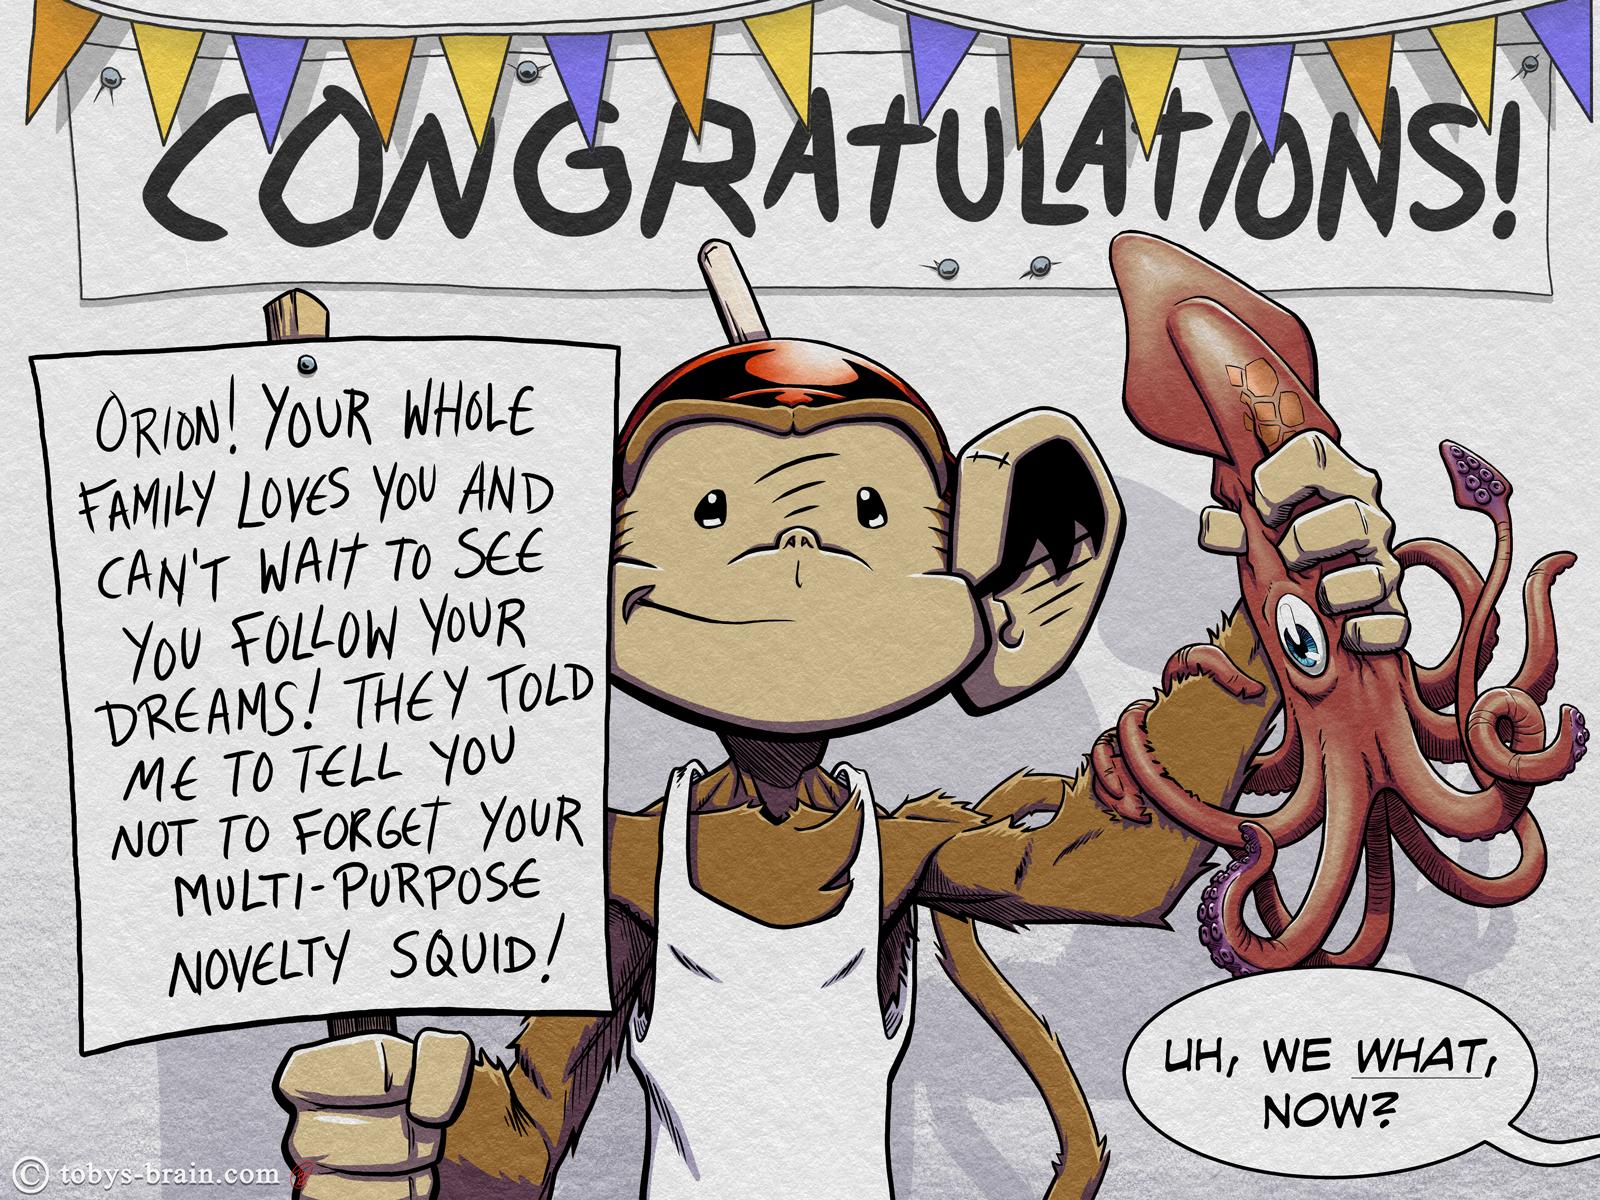 Congratulations Orion!